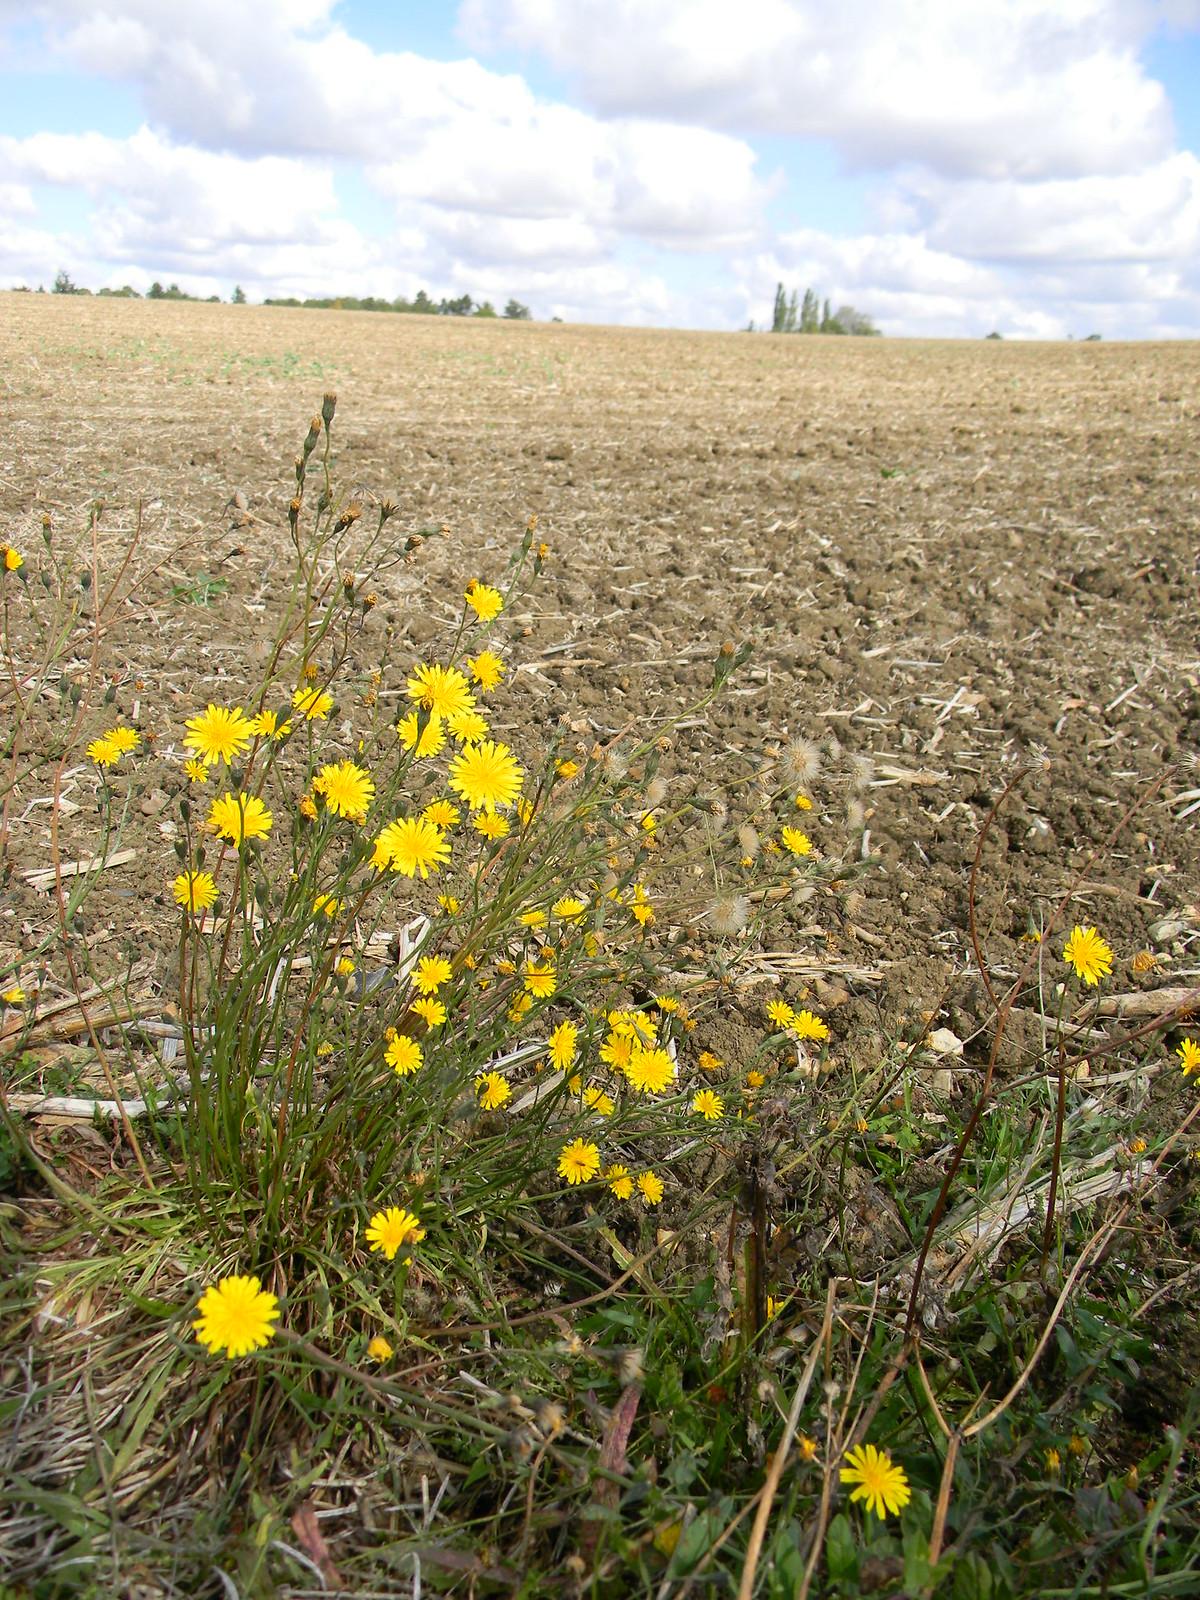 Not-dandelions and ploughed field Roydon to Sawbridgeworth